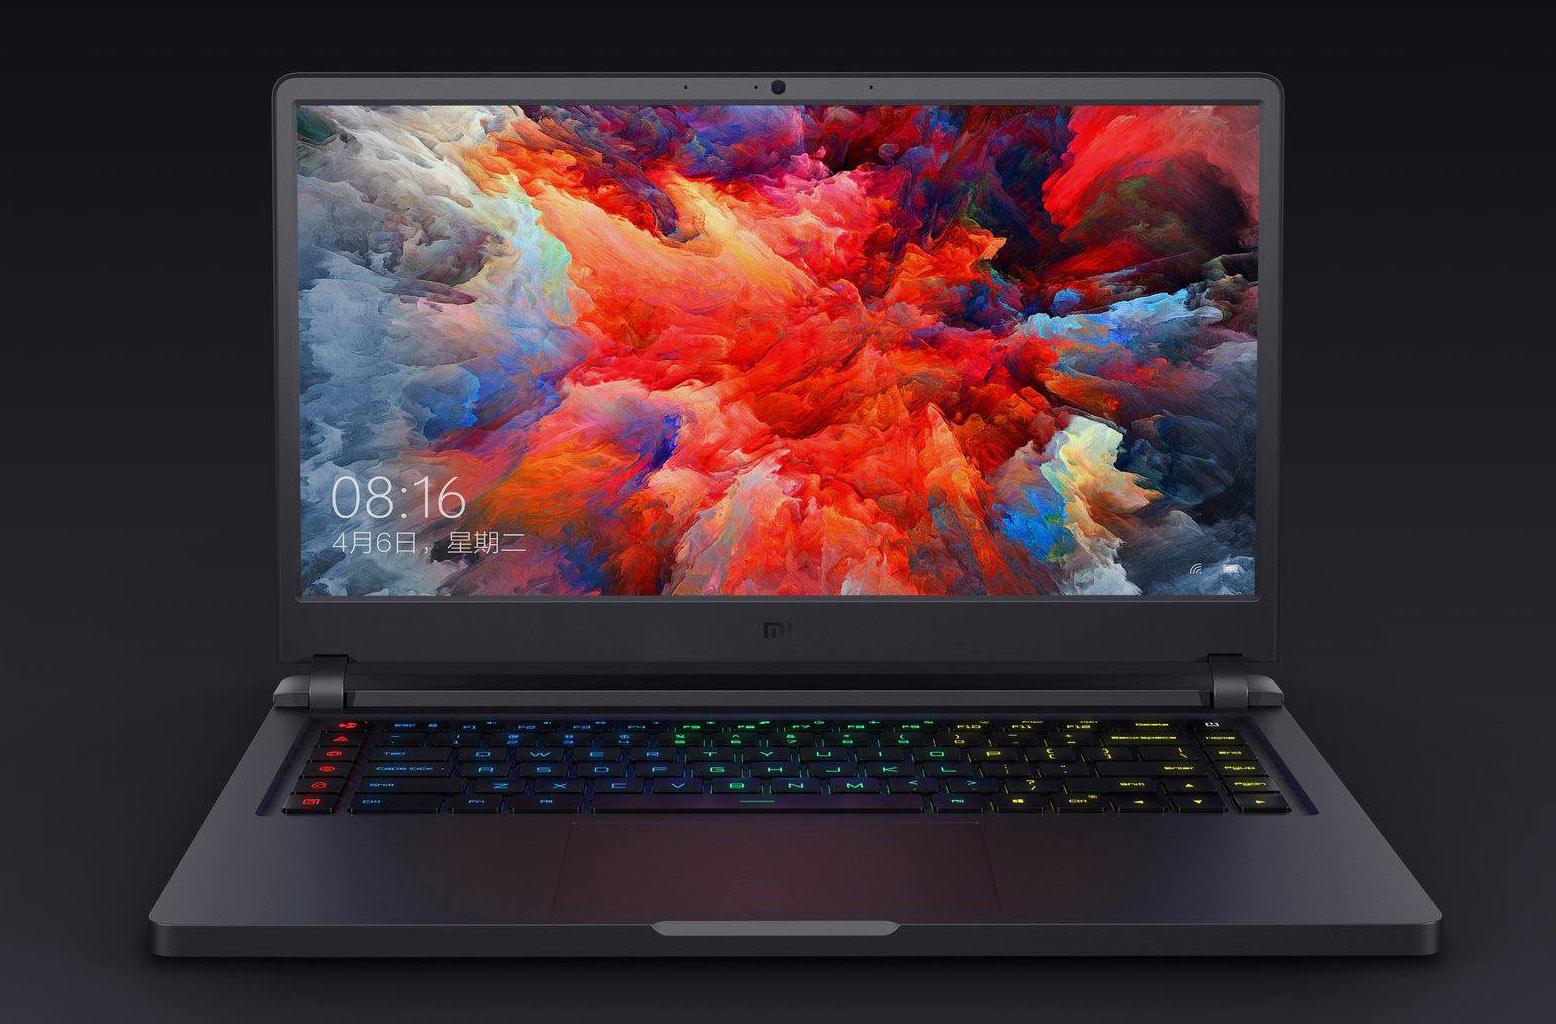 Mi Gaming Laptop, λοιπόν, έχει 15.6 ιντσες Full HD οθόνη με 9.9mm bezels και 4x16 εκατομ. χρωματικές ζώνες